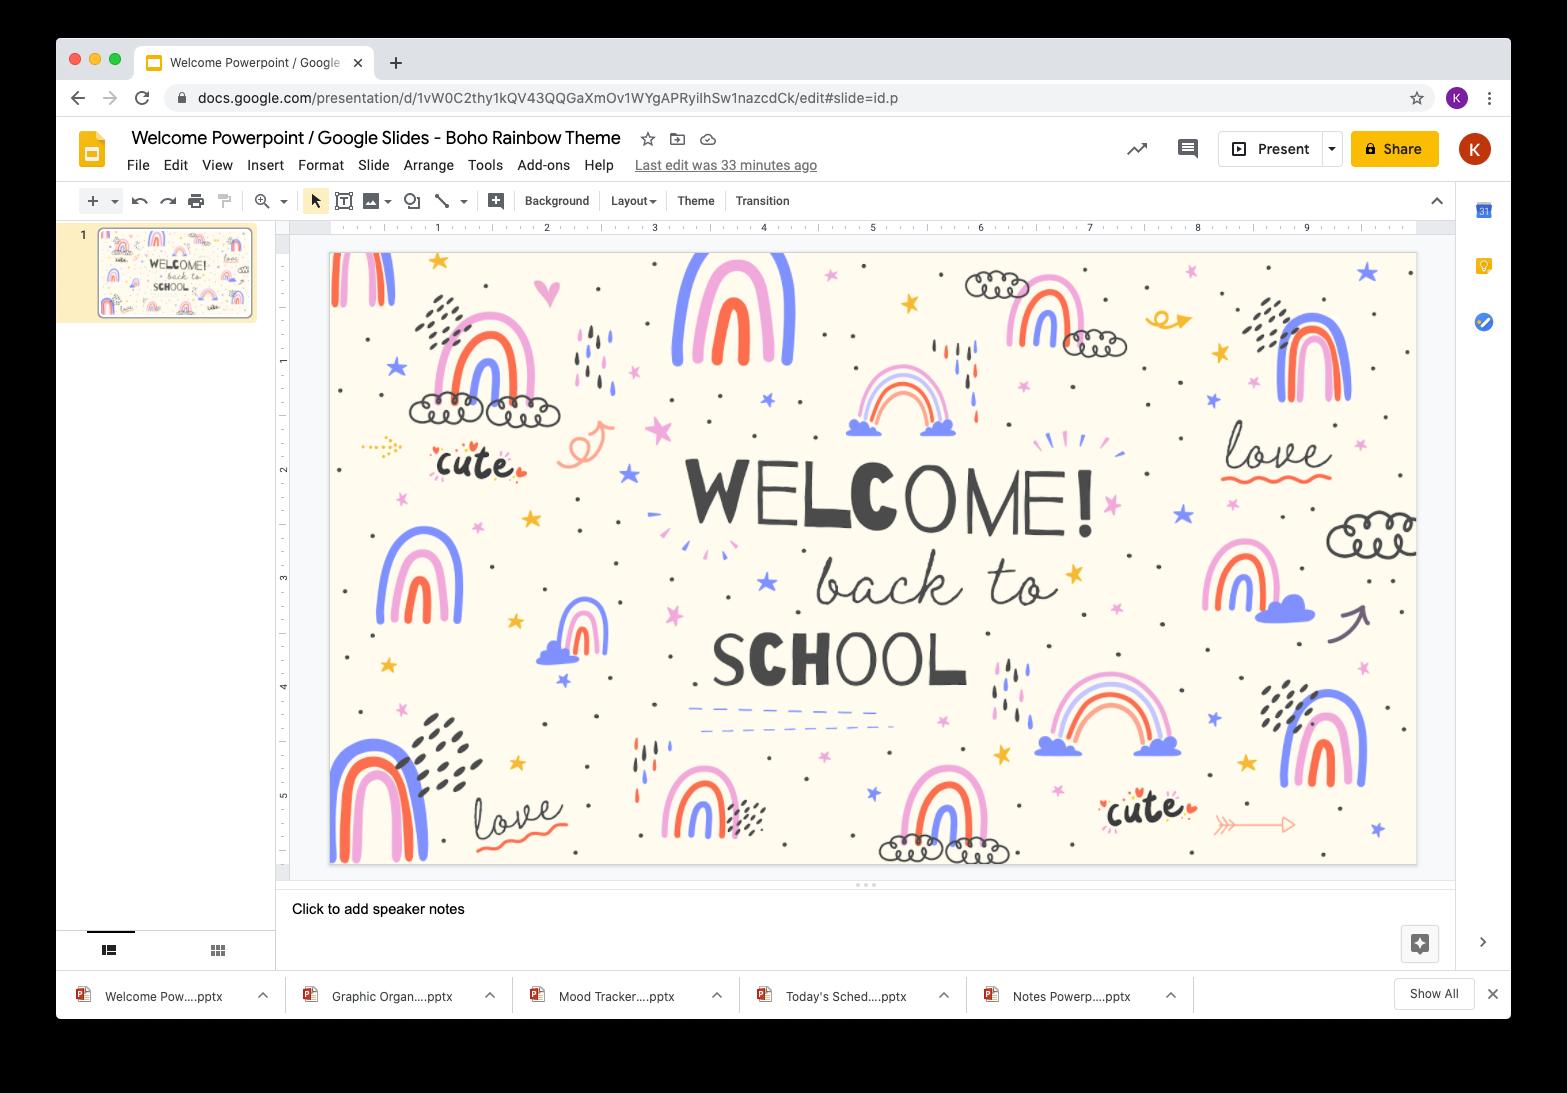 Welcome Powerpoint Google Slides Boho Rainbow Theme Powerpoint Rainbow Theme Google Slides